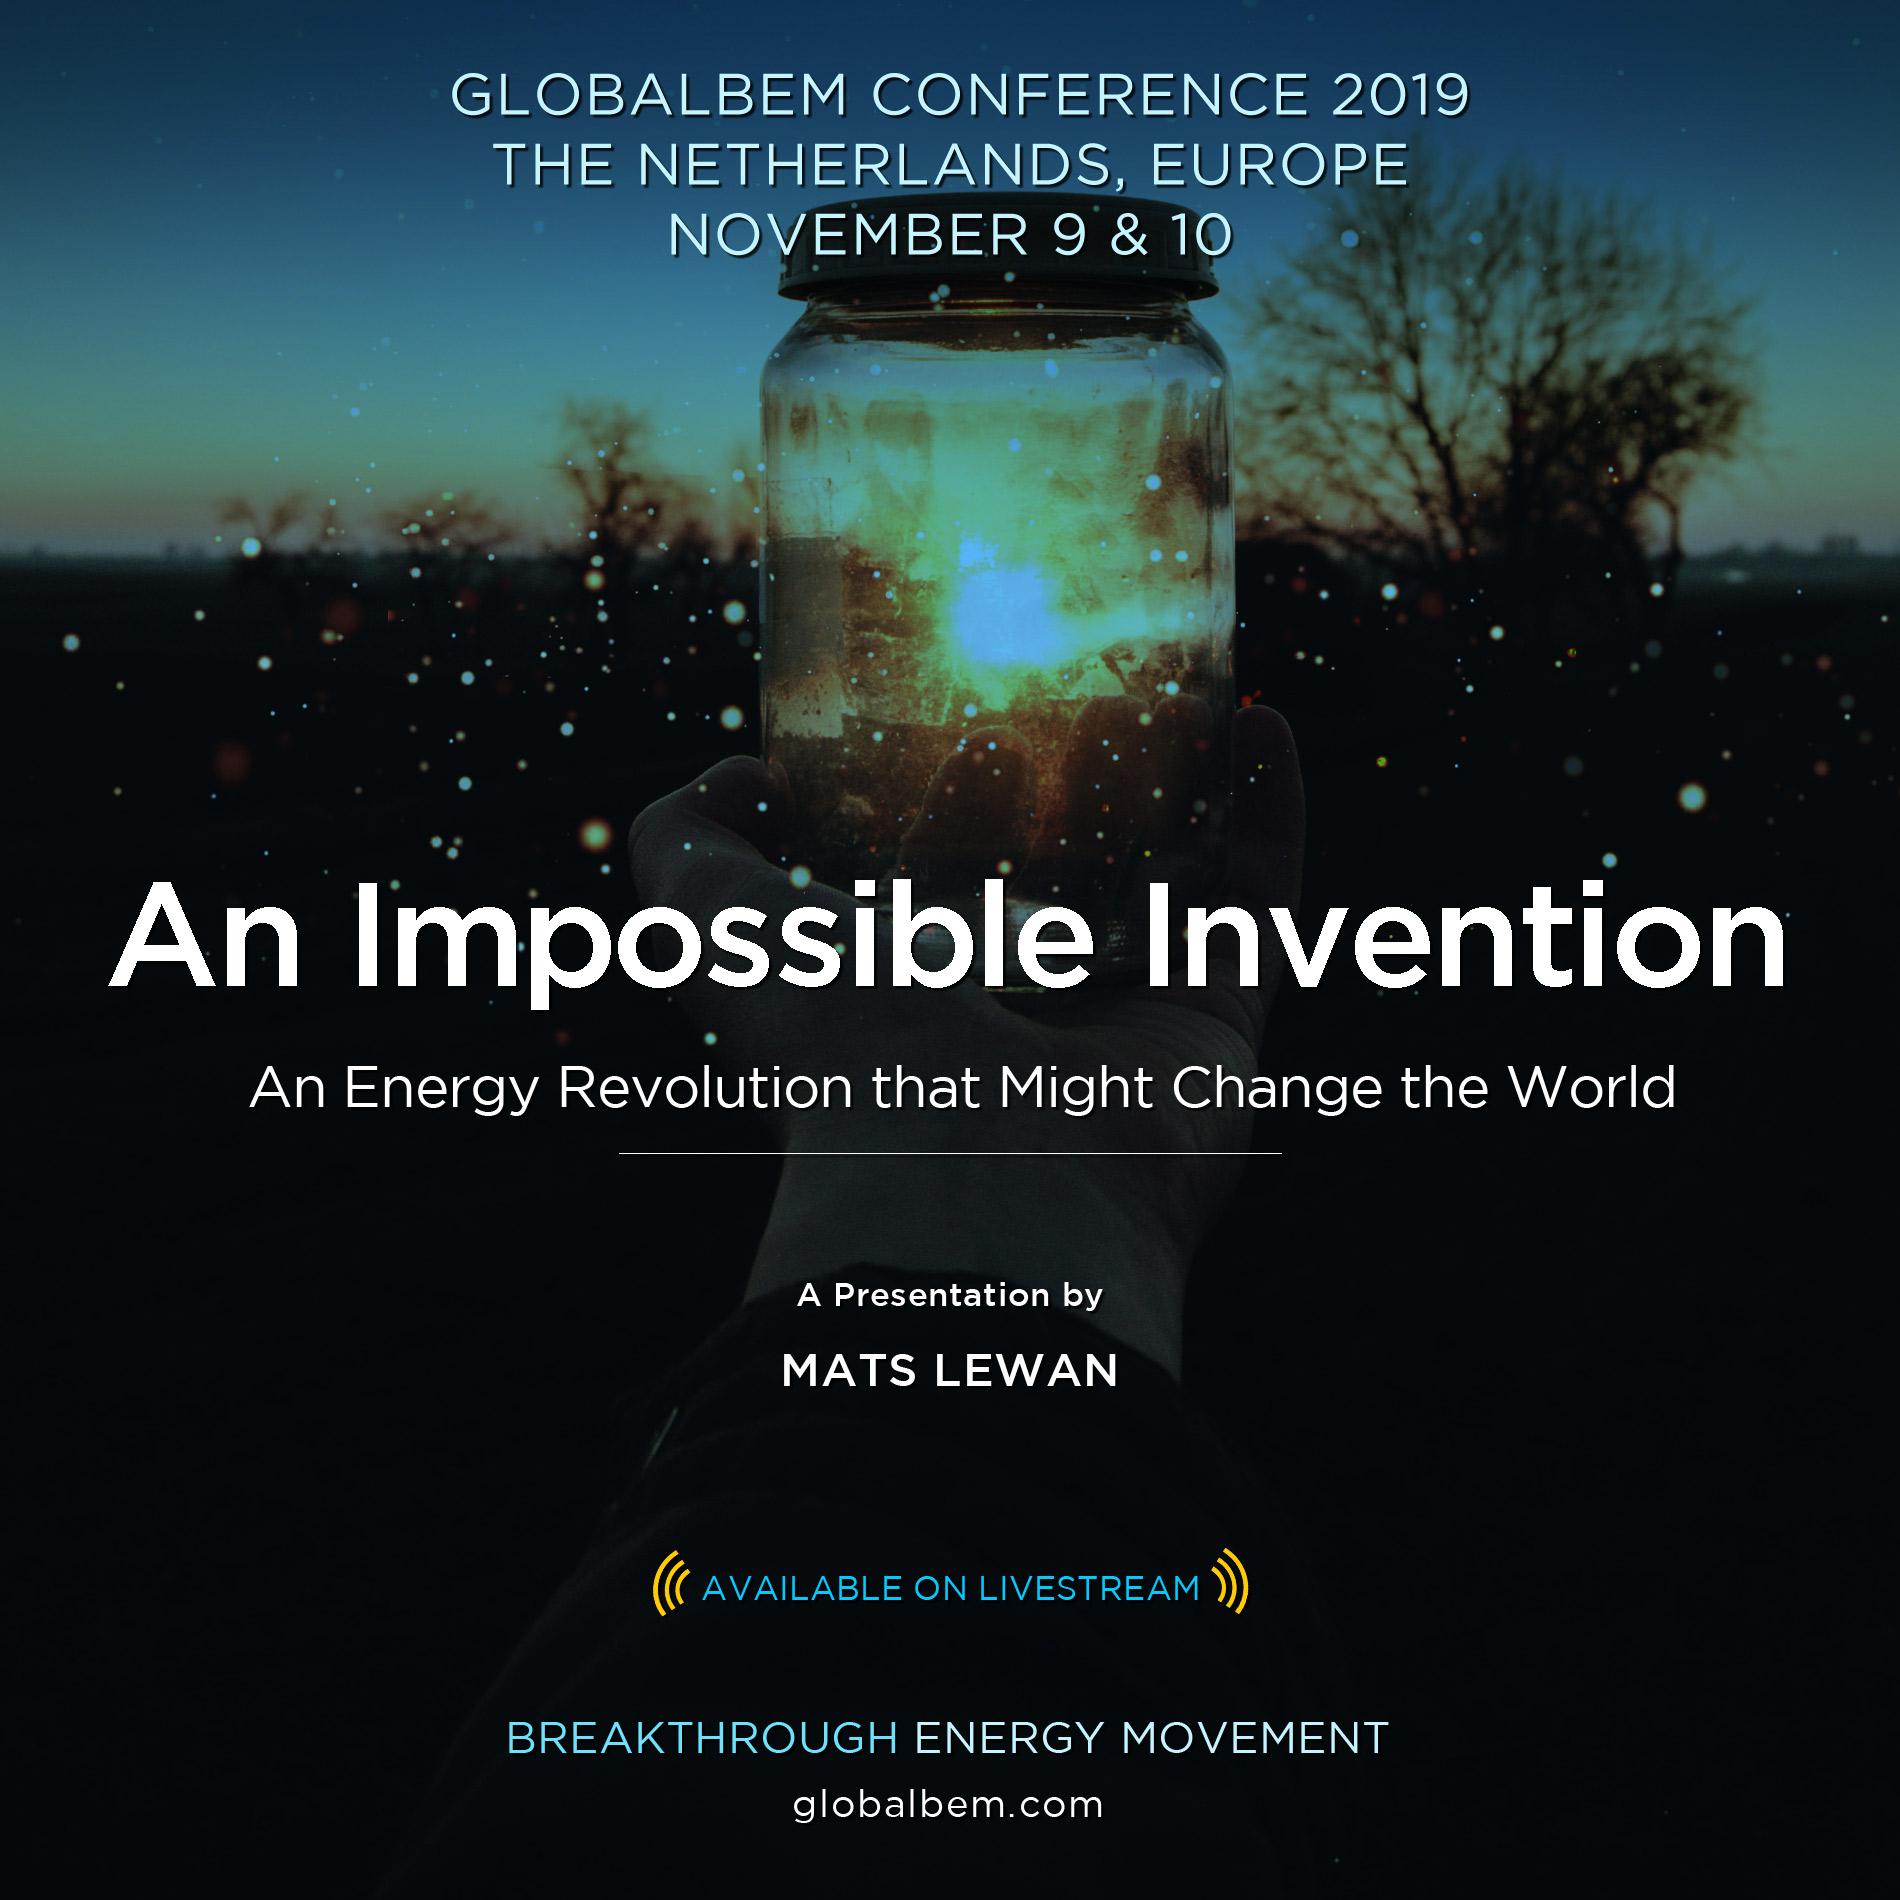 https://globalbem.com/wp-content/uploads/2019/10/145-Presentation-Promo-MatsLewan.jpg